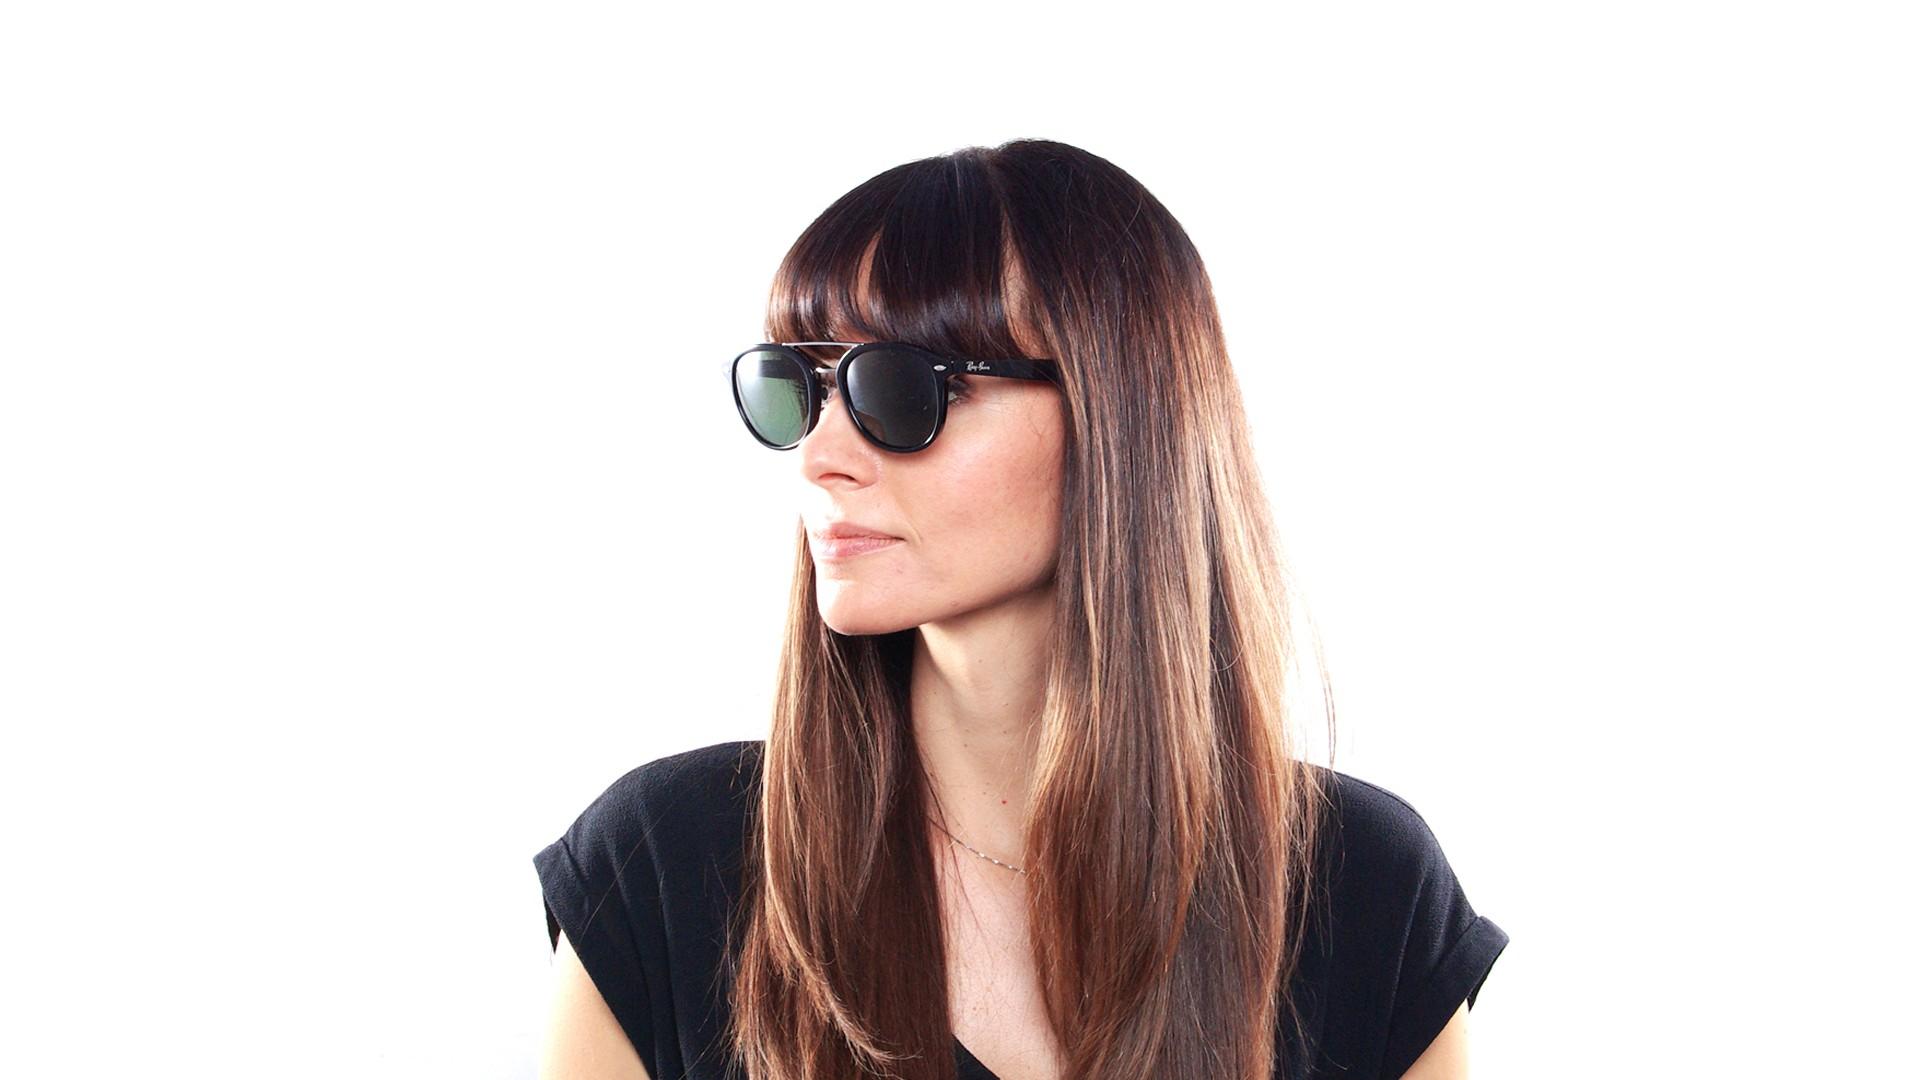 006423490d Sunglasses Ray-Ban Highstreet Black RB2183 901 9A 53-21 Medium Polarized